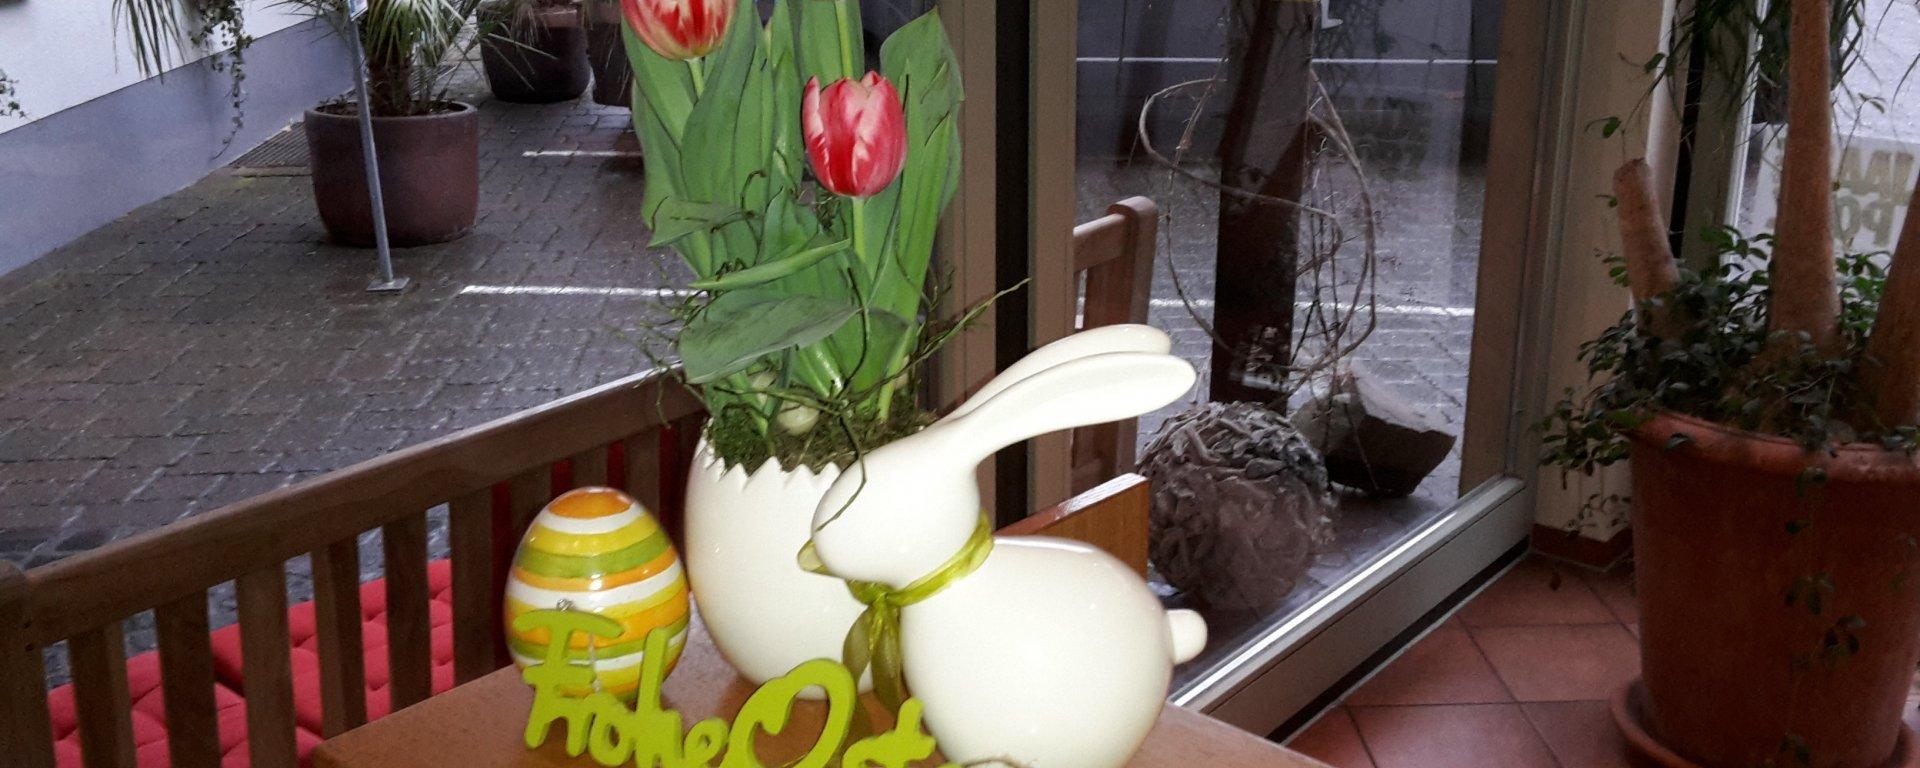 Ostern im Ahrtal, 4 Nächte